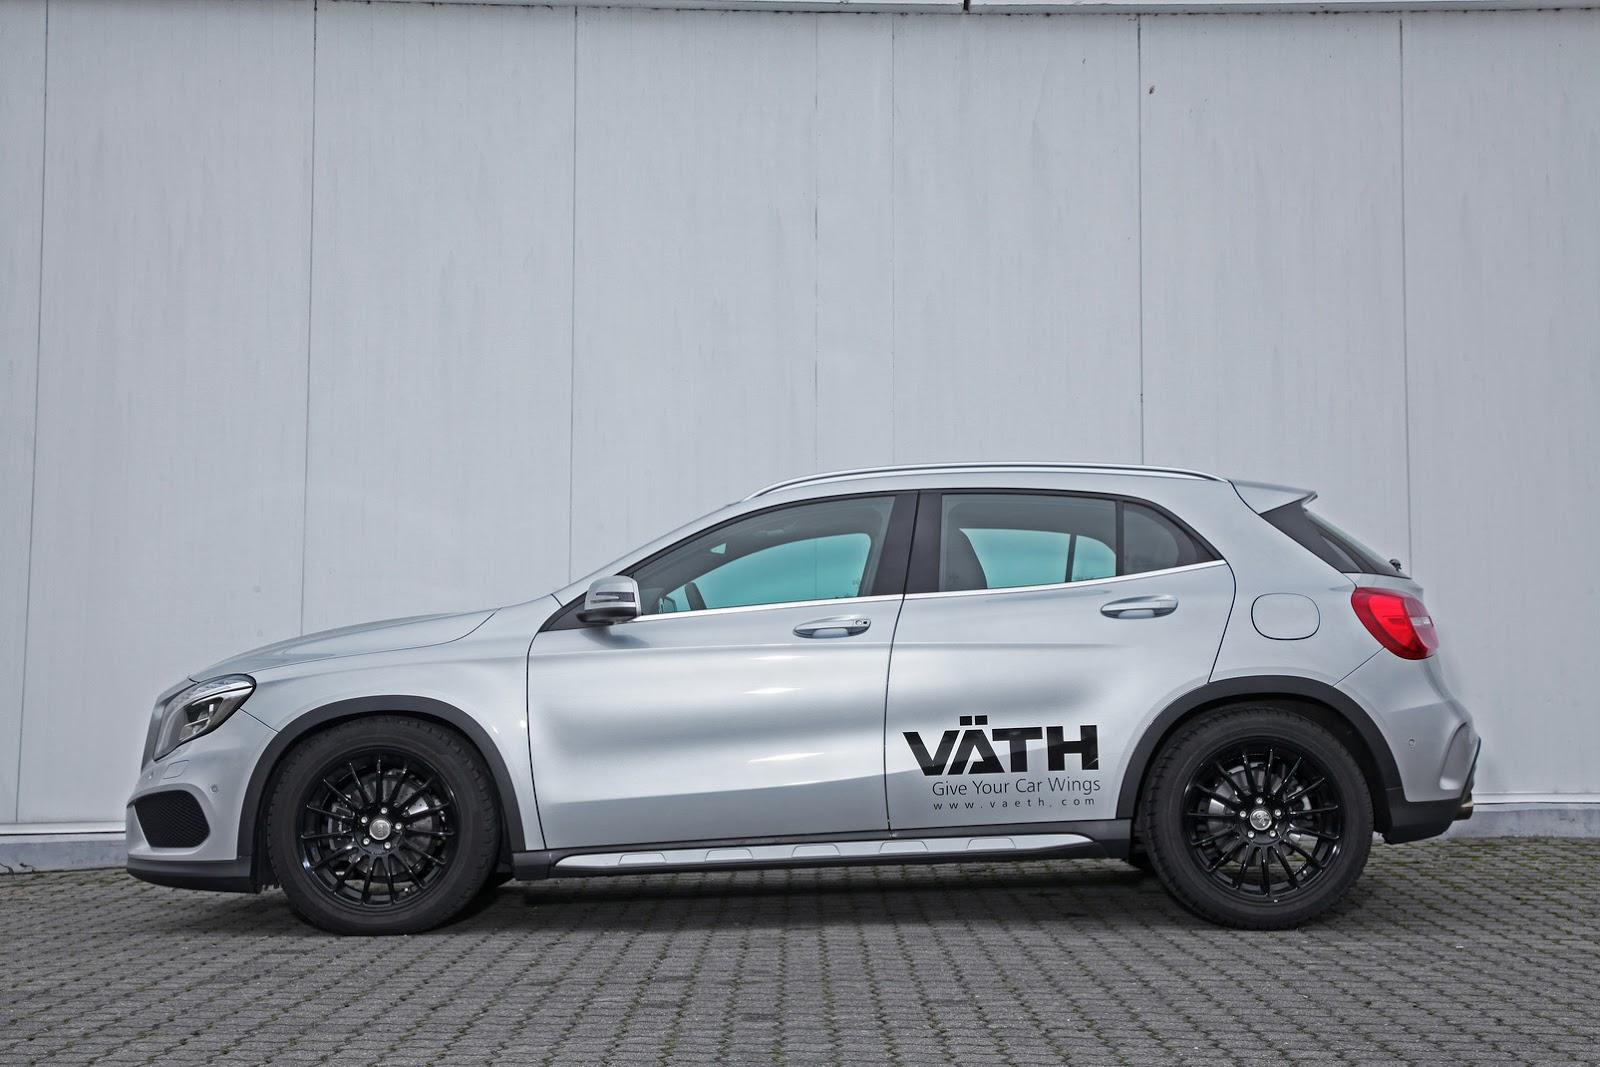 vath adds some spunk to mercedes benz gla 200 carscoops. Black Bedroom Furniture Sets. Home Design Ideas